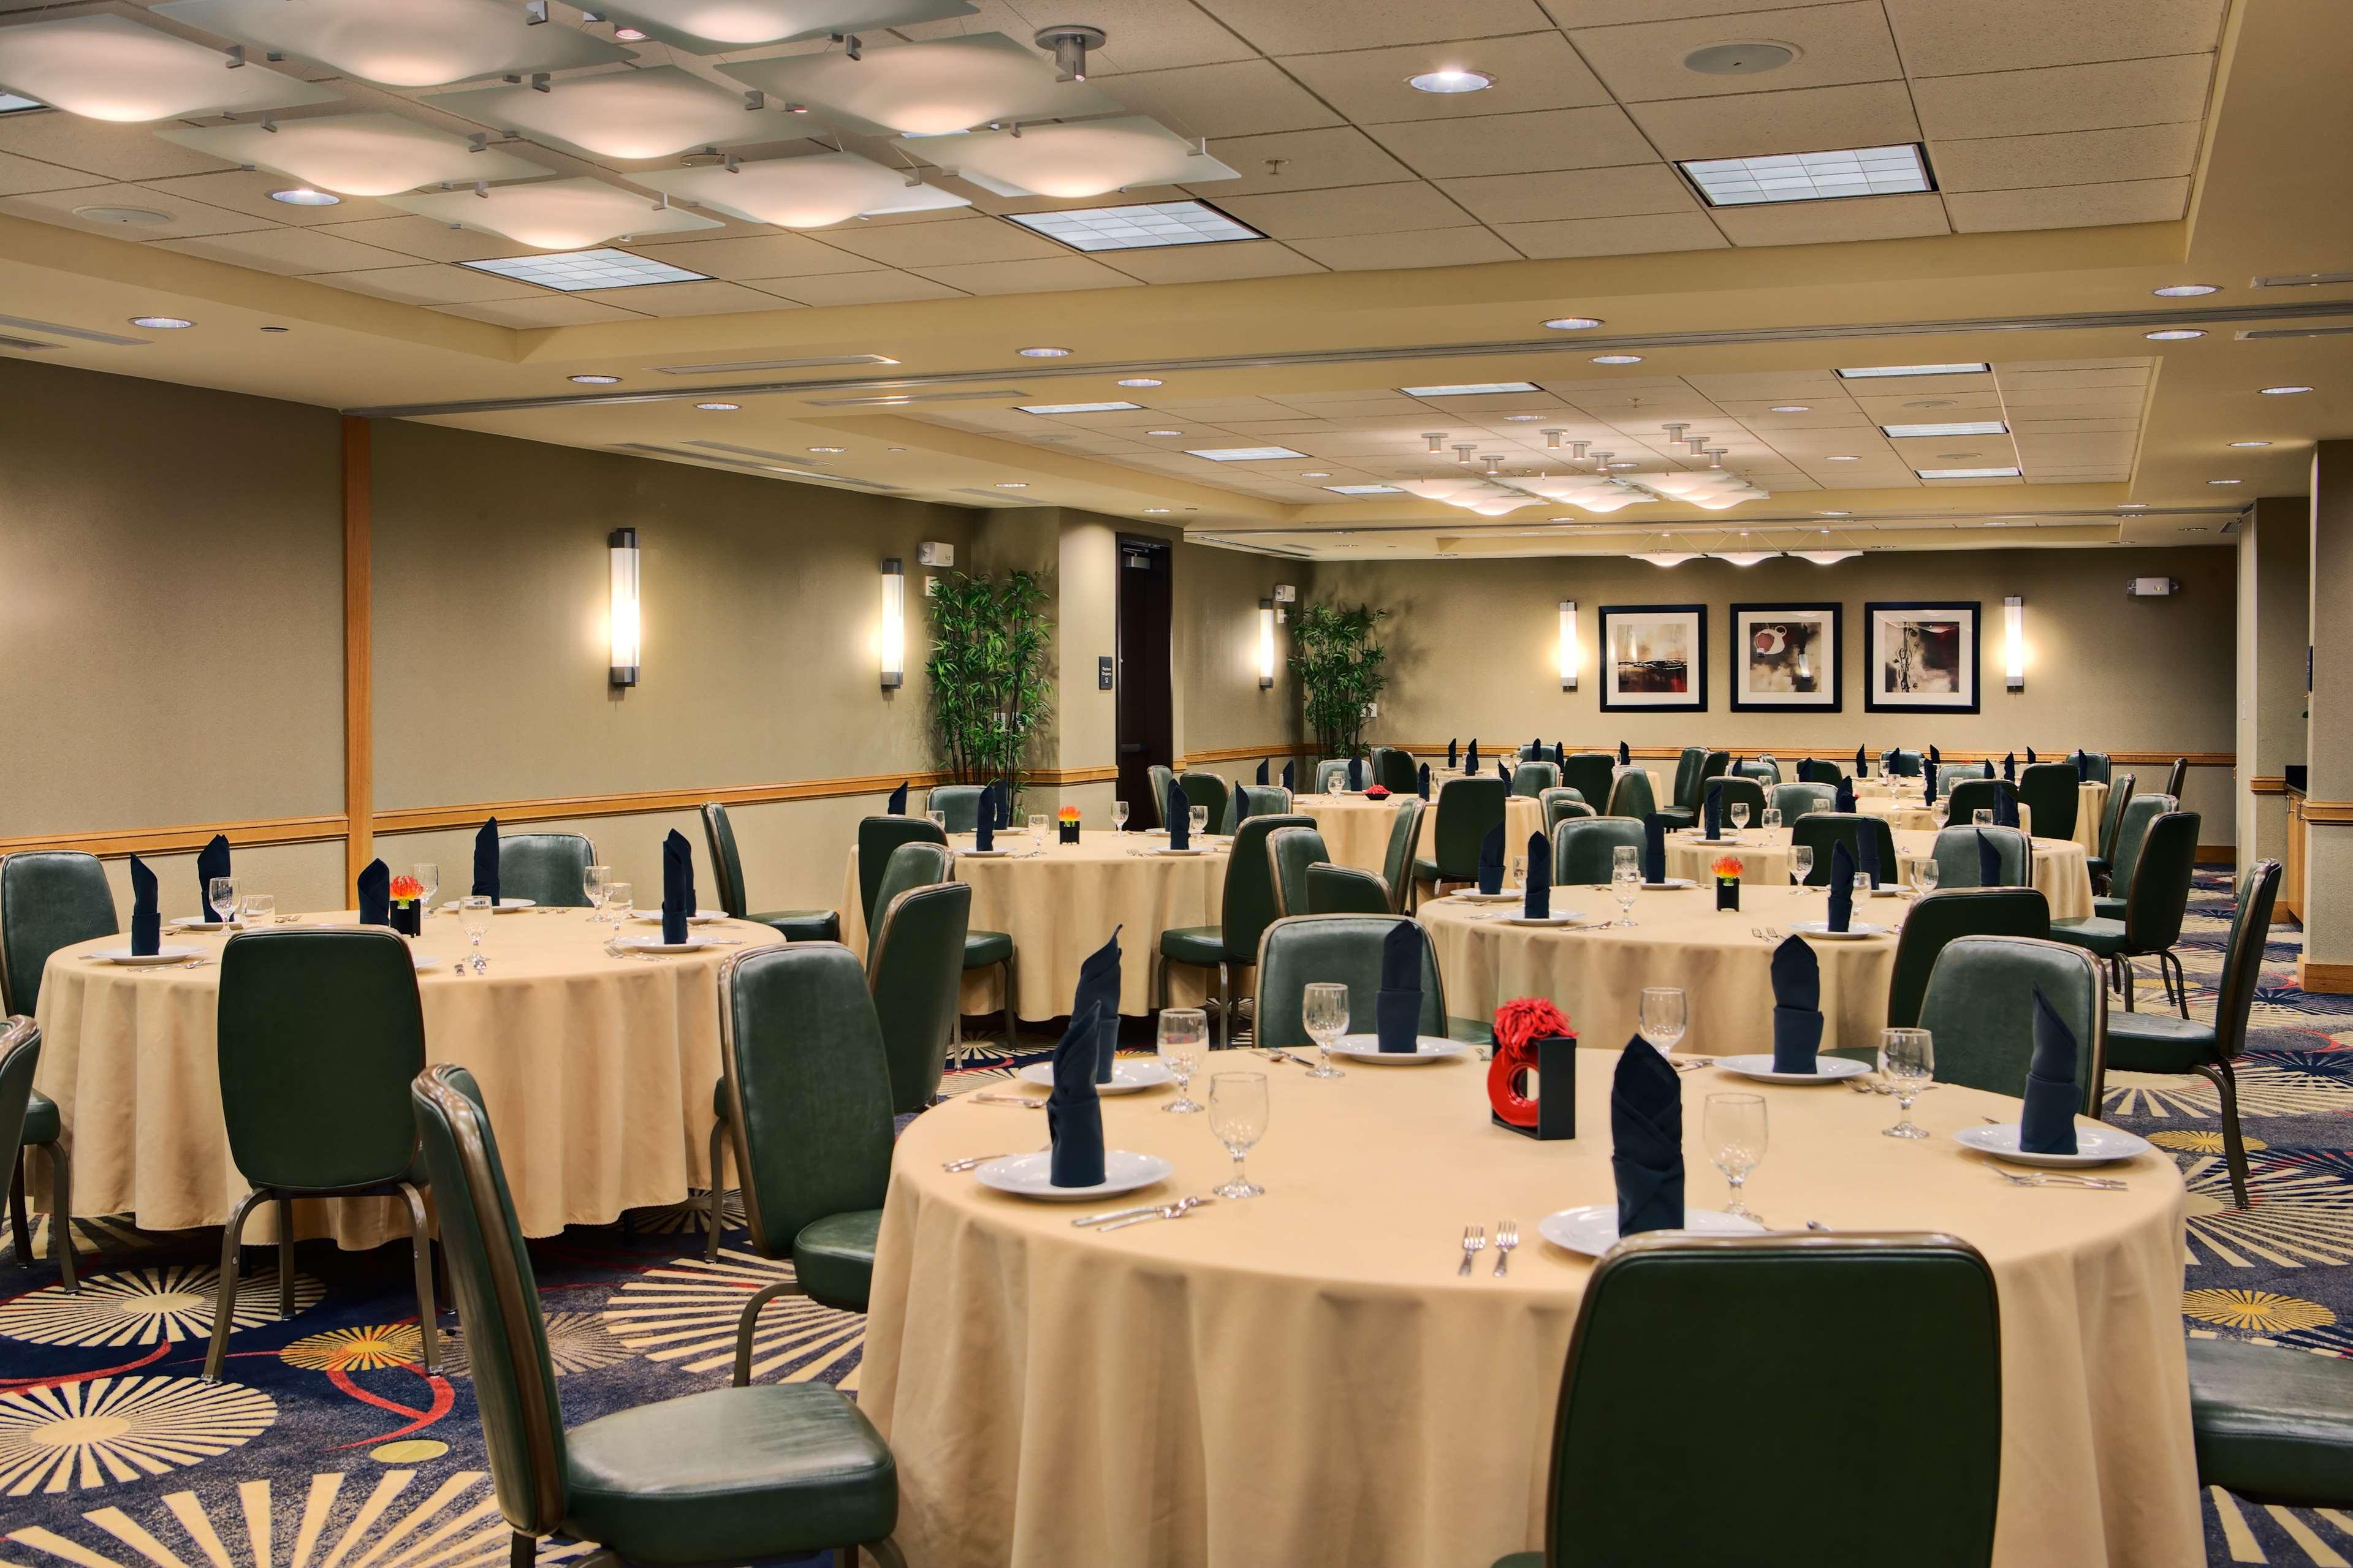 Hilton Garden Inn DFW North Grapevine image 41